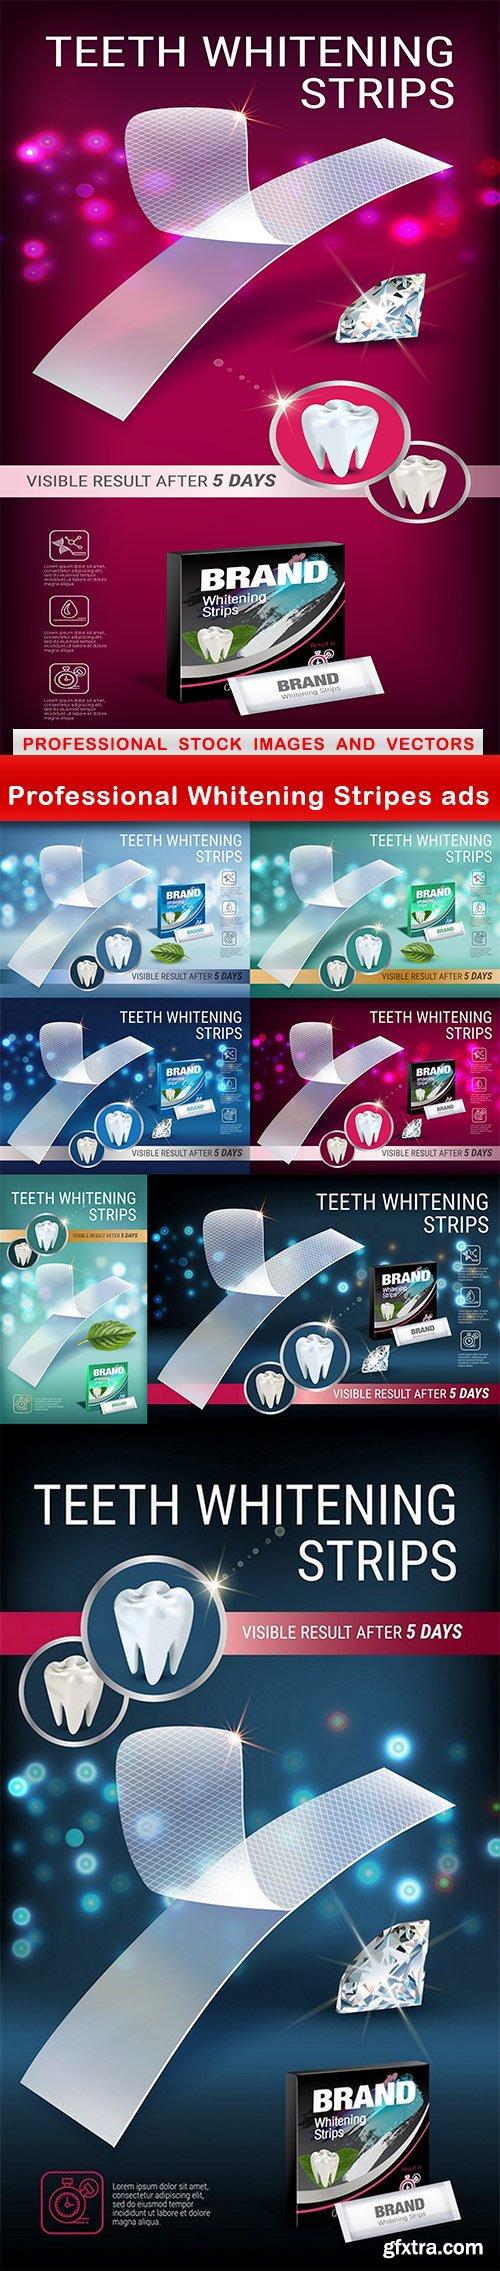 Professional Whitening Stripes ads - 8 EPS